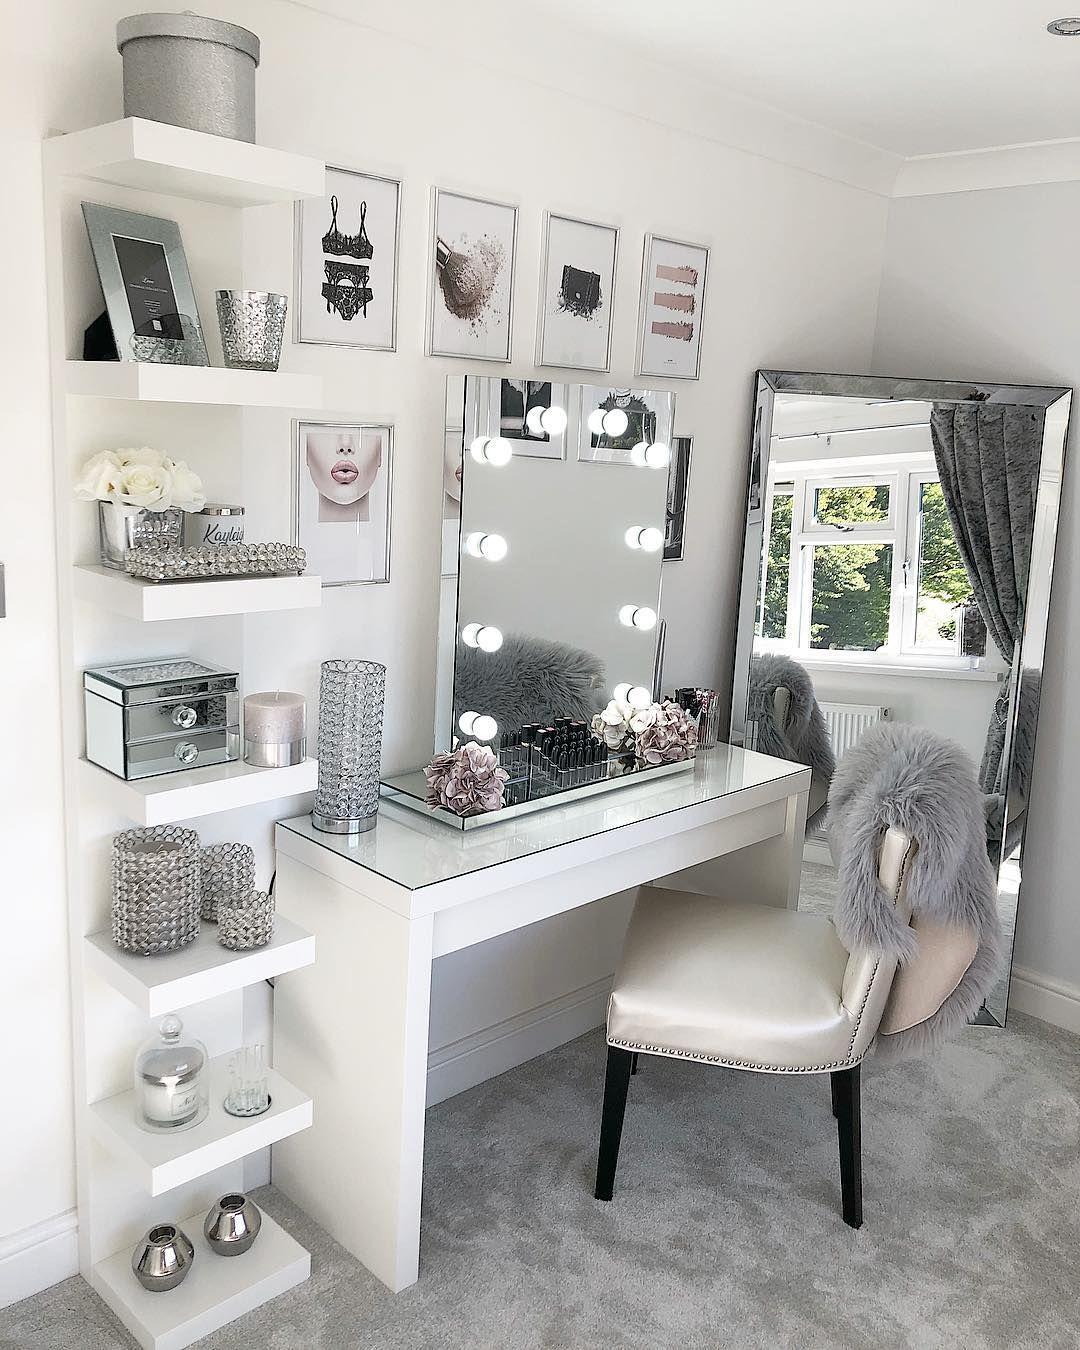 Interior Decor Inspo On Instagram Moreeeeeee